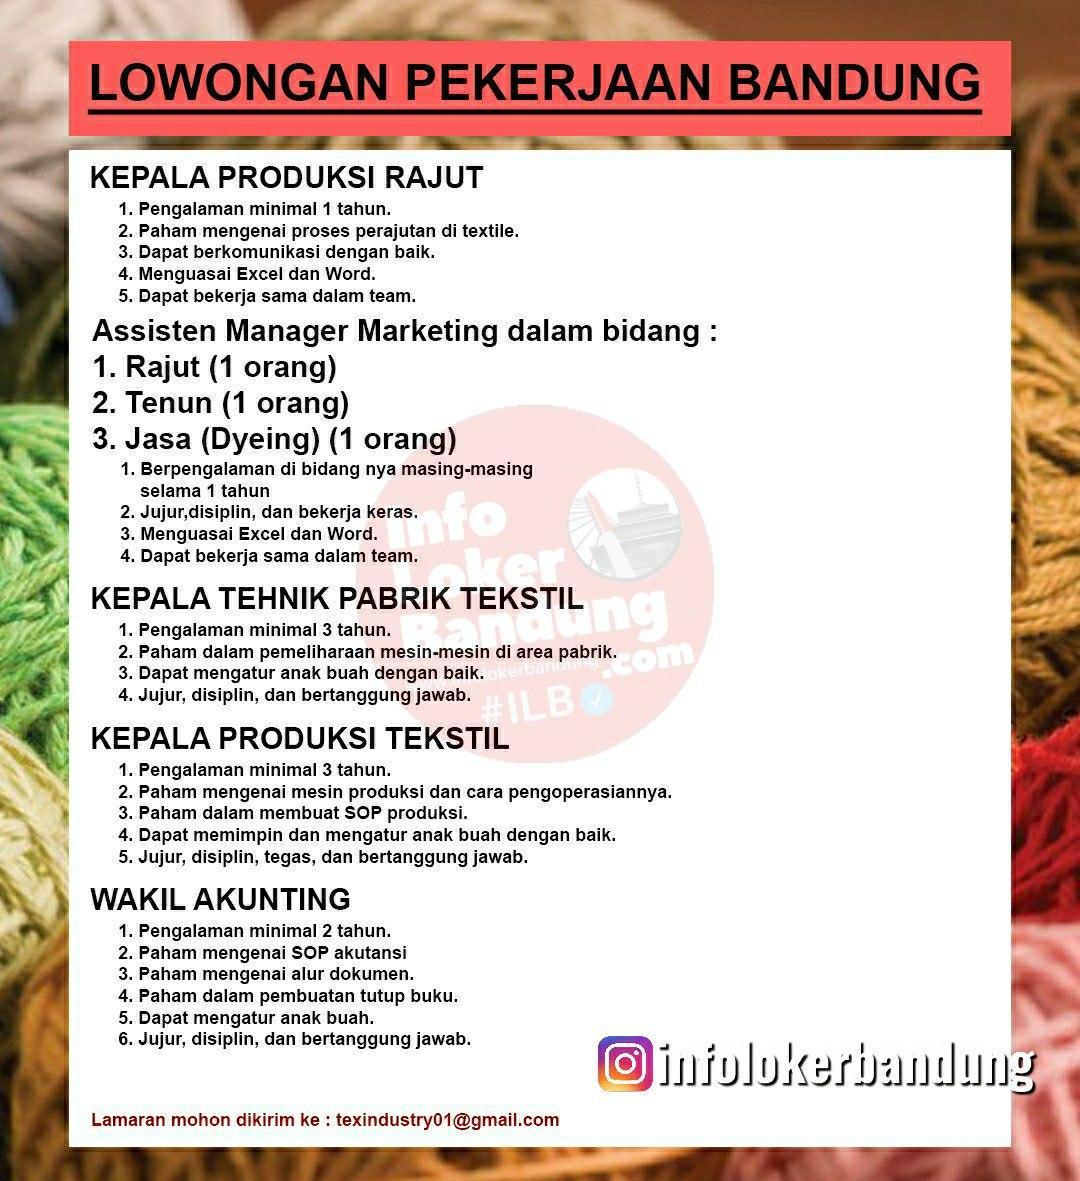 Lowongan Kerja Textile Industries Bandung September 2020